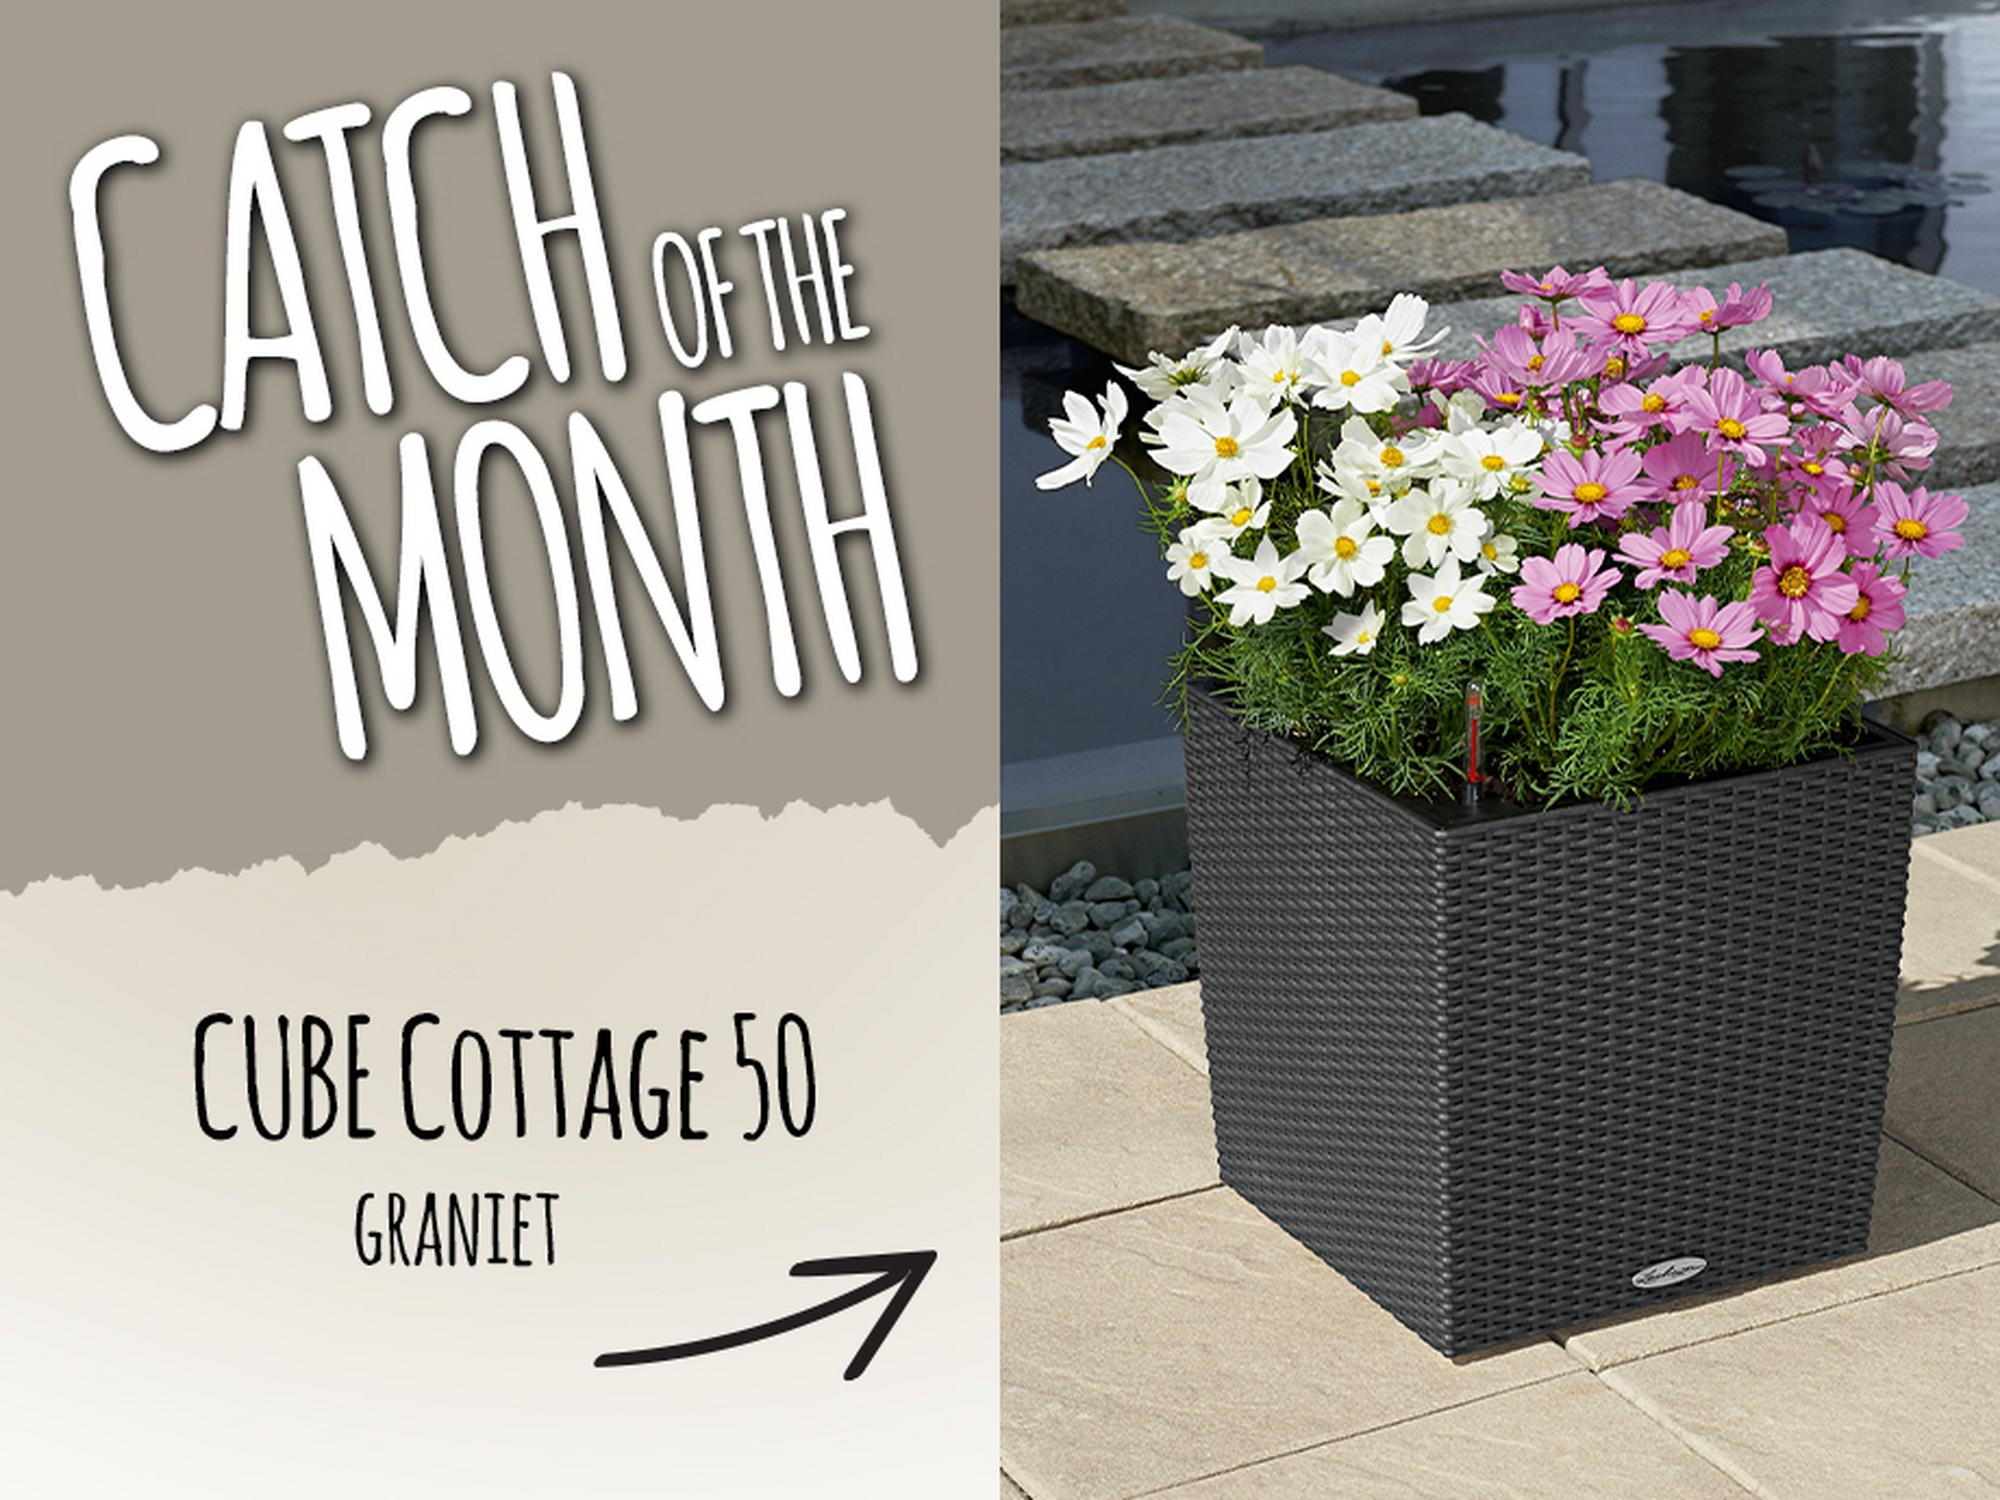 Catch of the Month: 15% korting op de CUBE Cottage 50 graniet